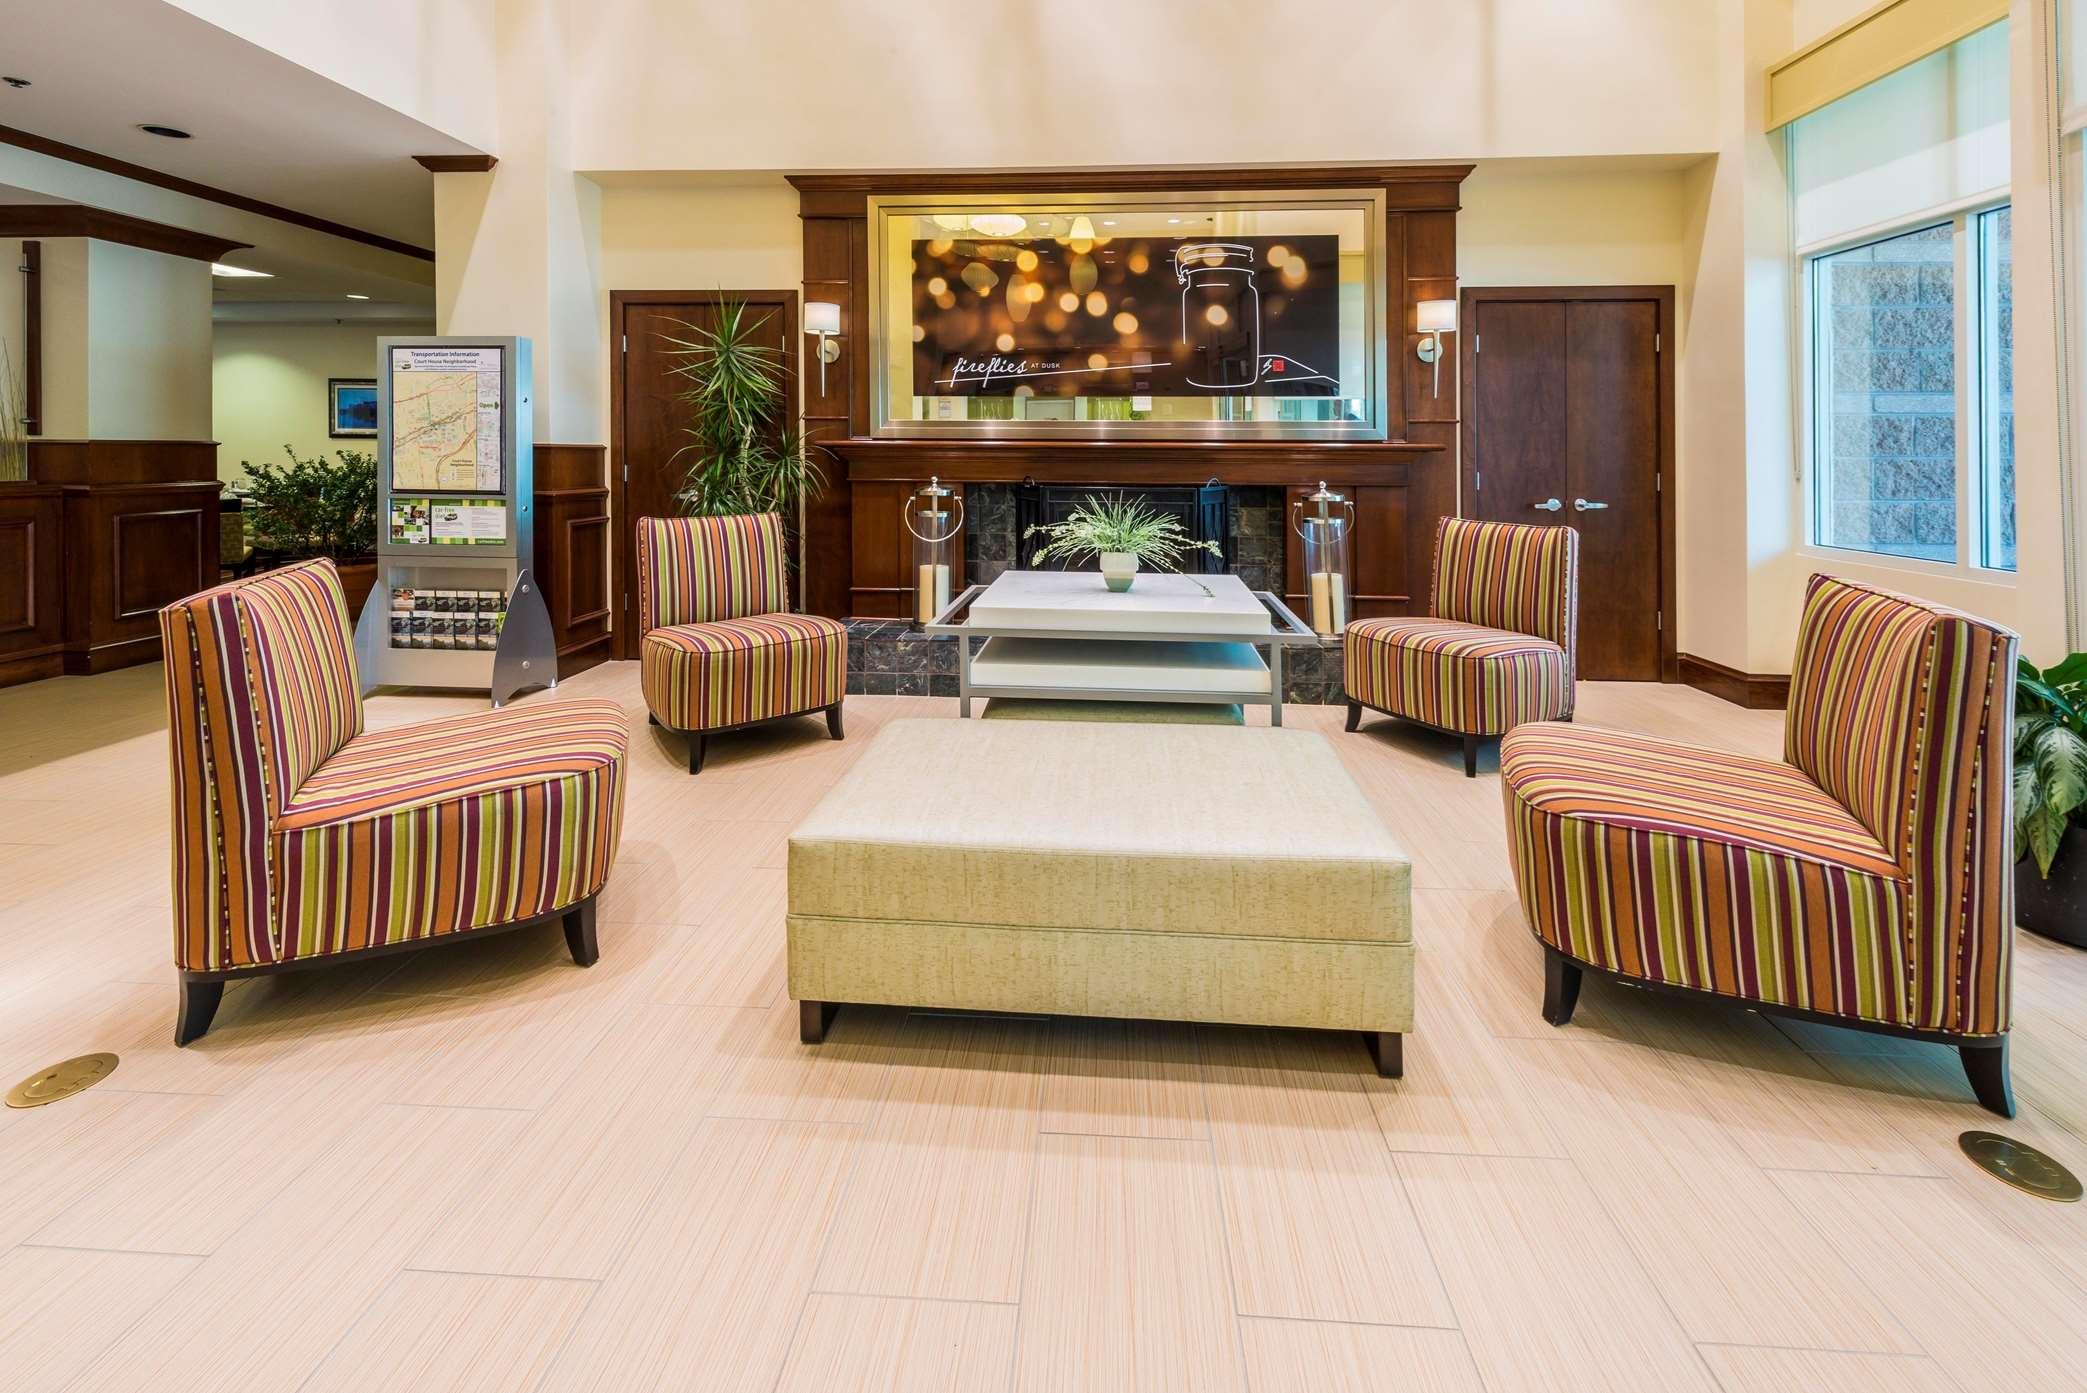 Hilton Garden Inn Arlington/Courthouse Plaza image 1